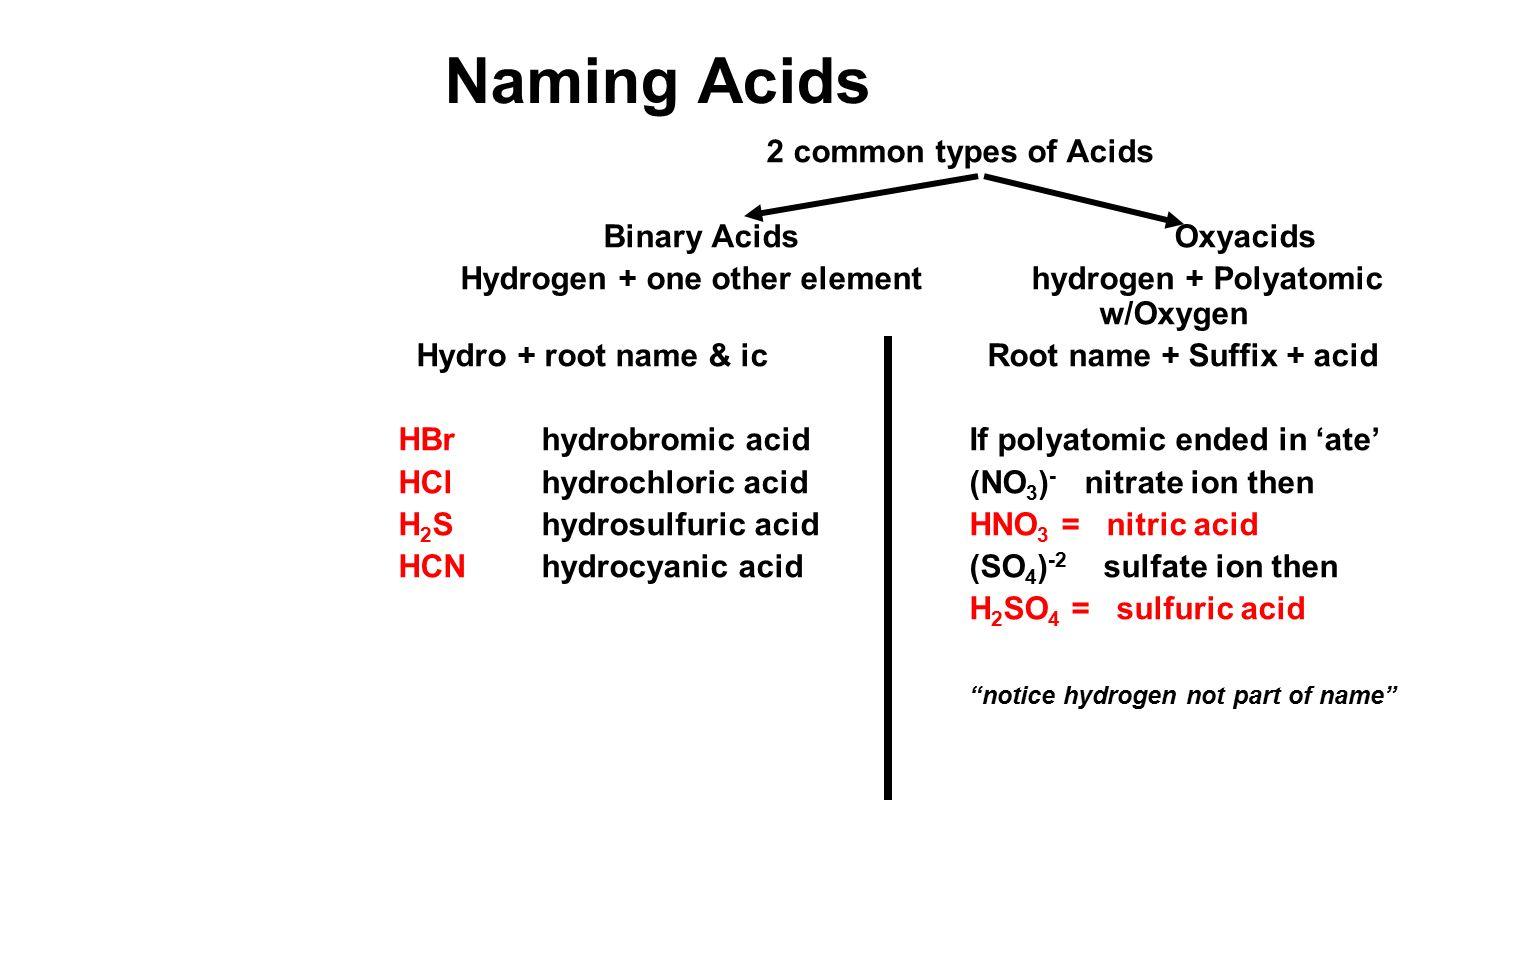 Naming Acids Worksheet Worksheet – Naming Acids and Bases Worksheet